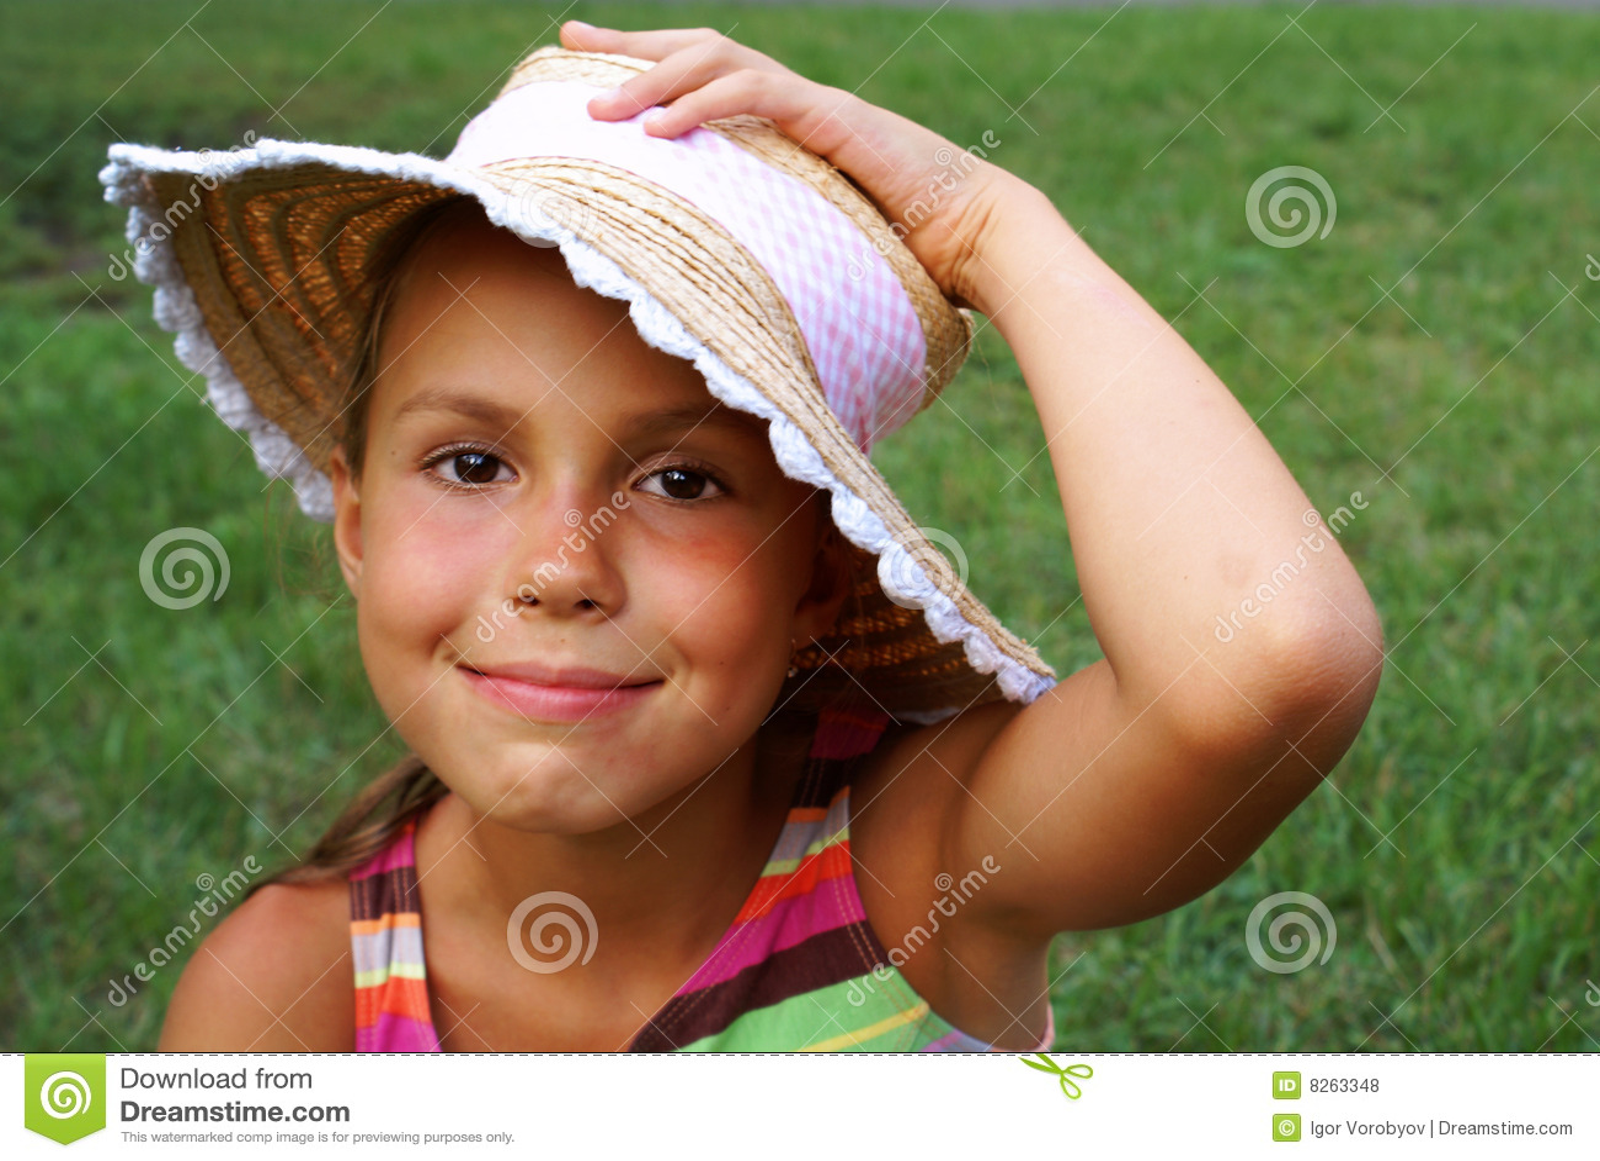 Young Tween Girl Face